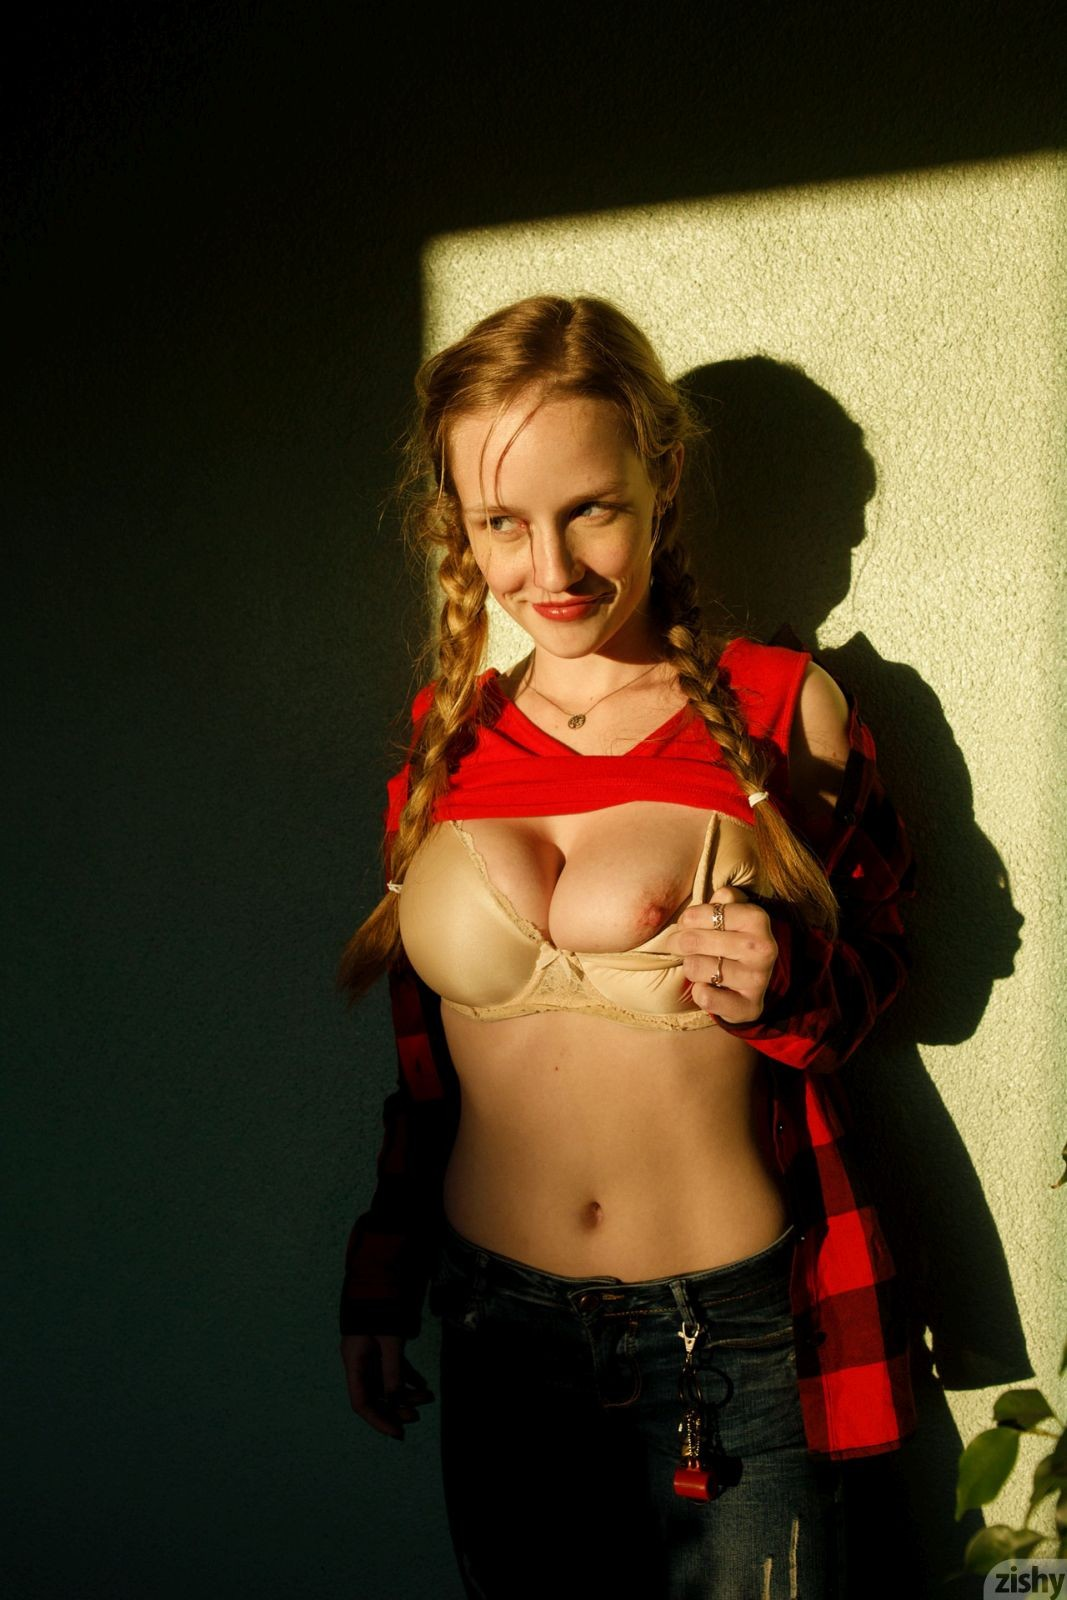 Grace van patten tits